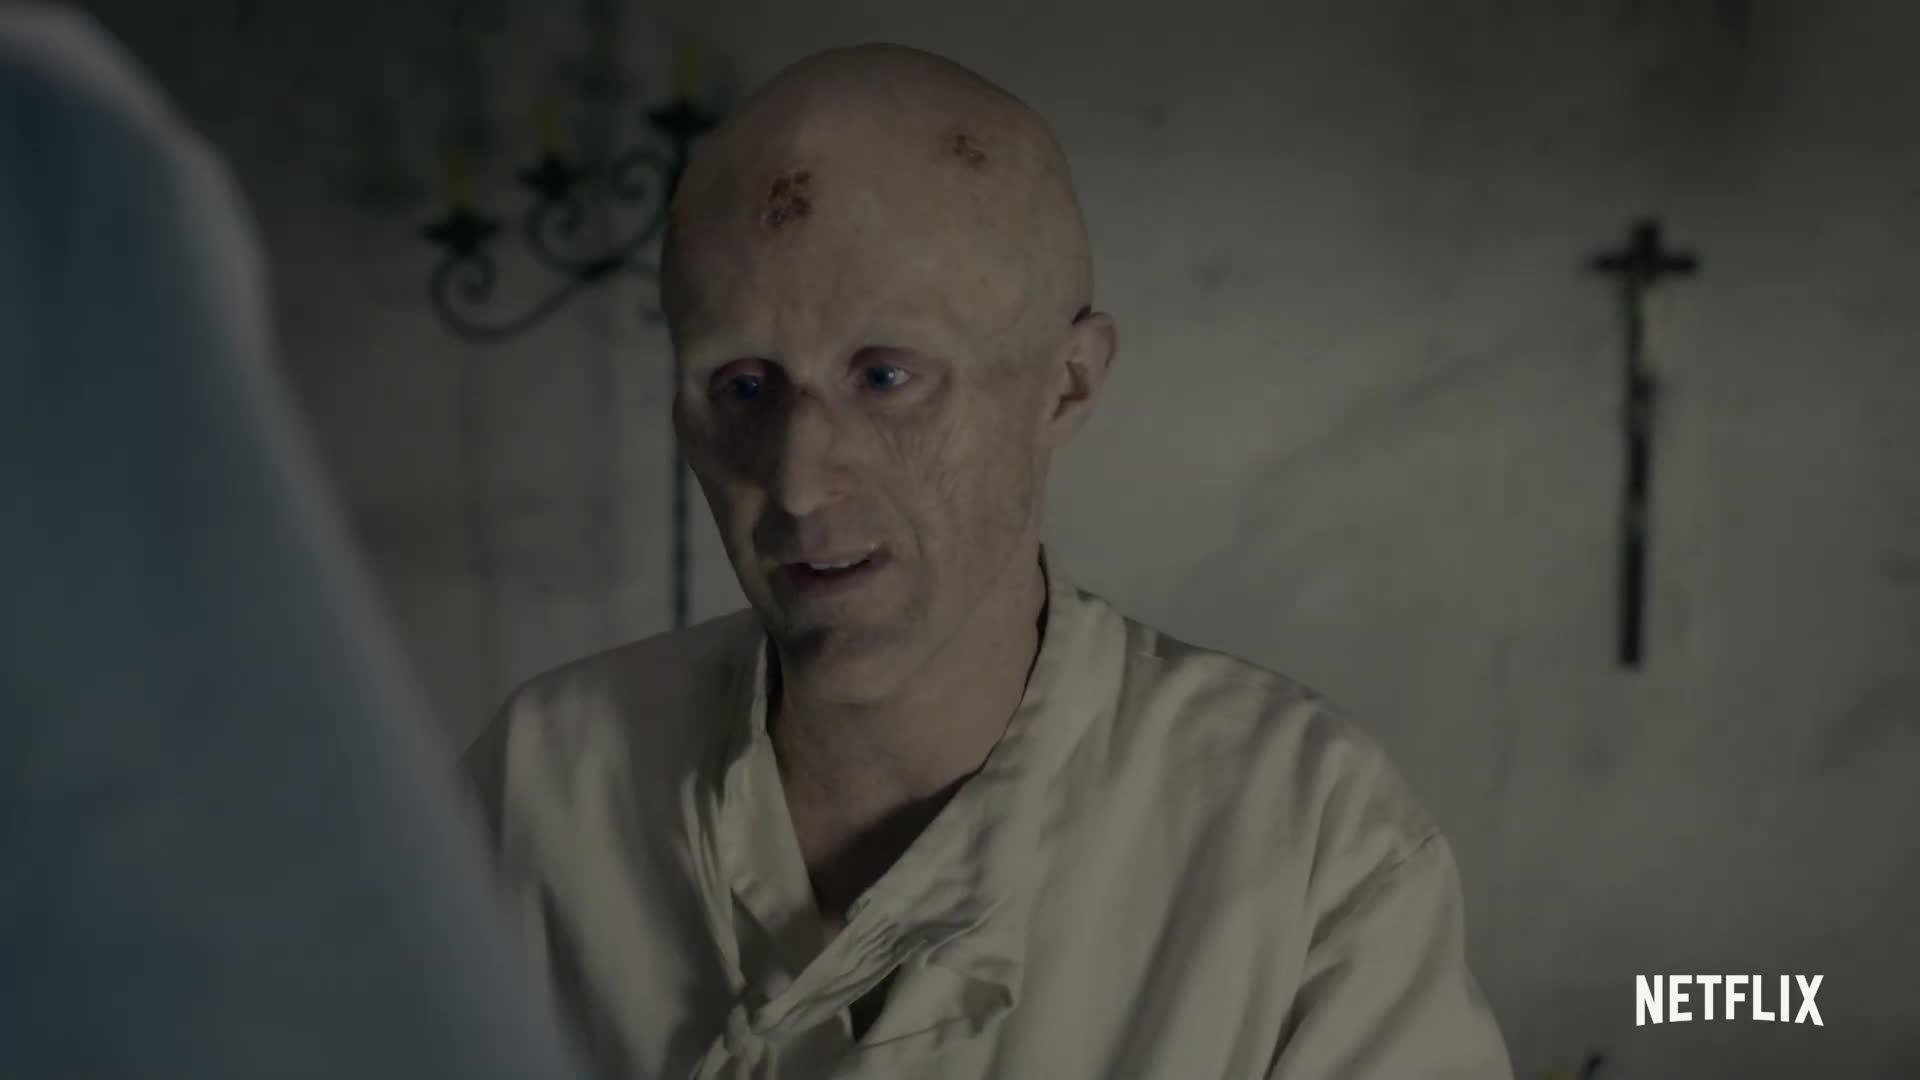 Trailer, Netflix, Serie, Horror, Dracula